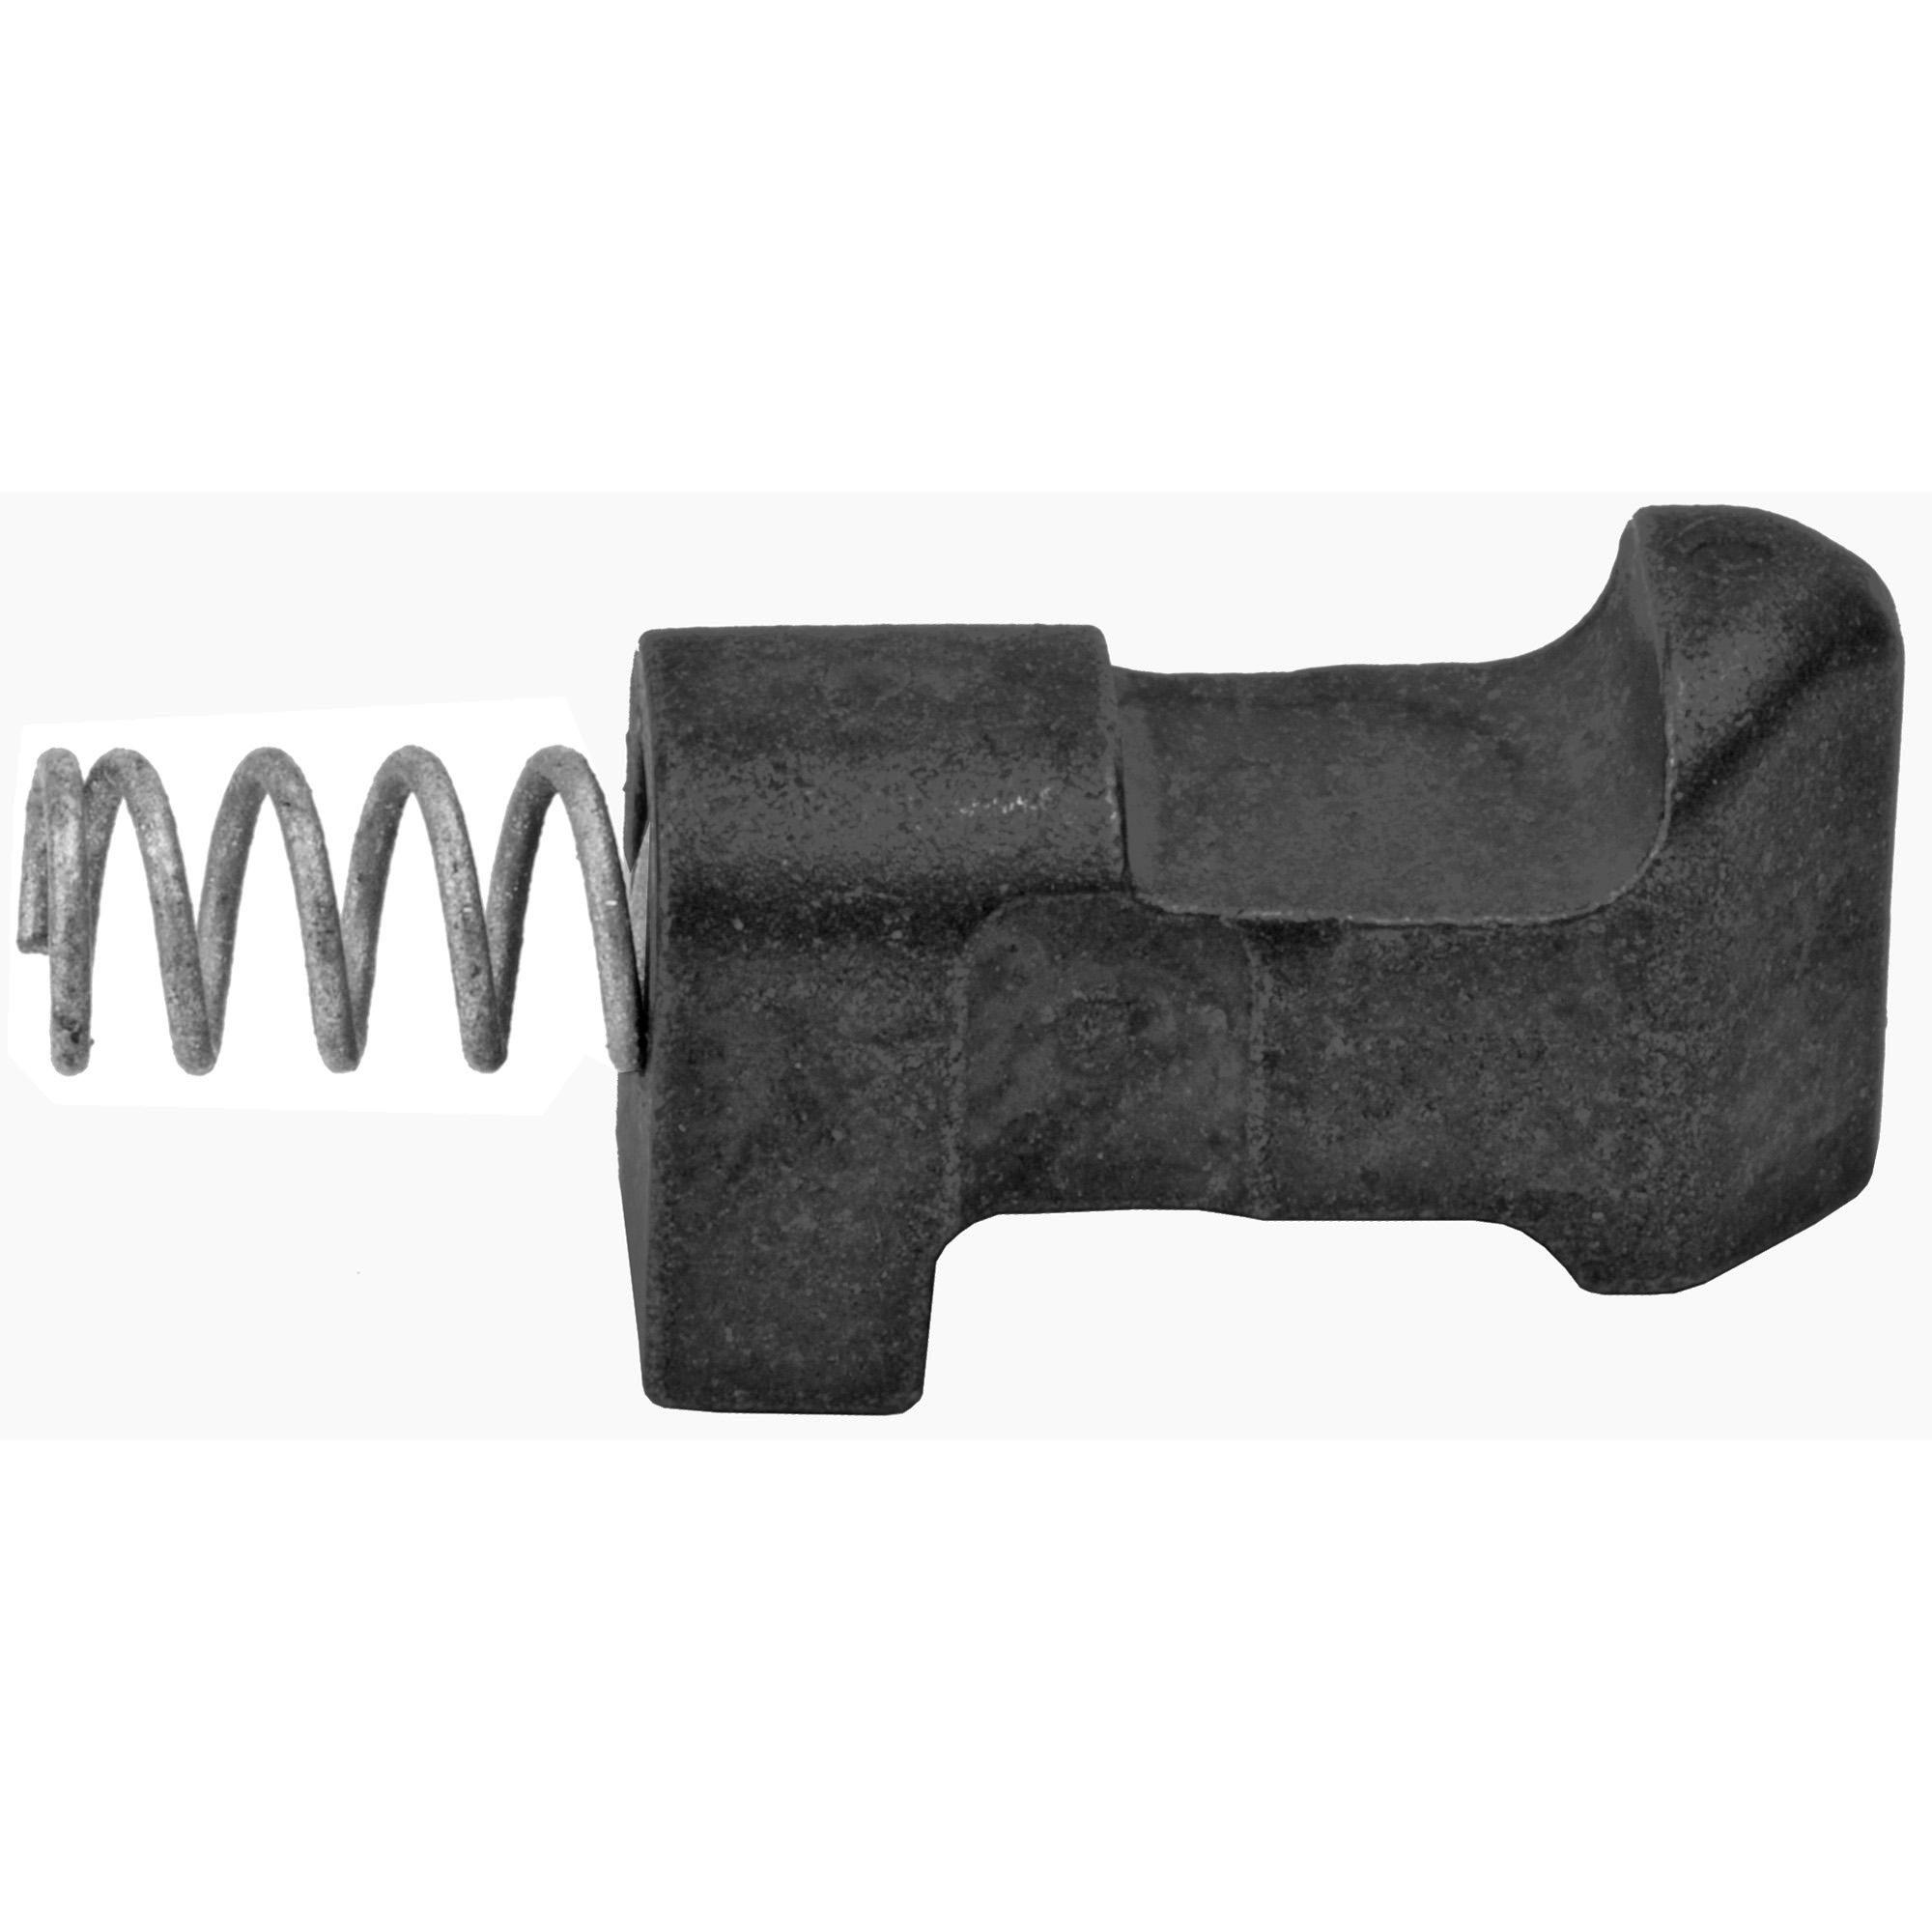 Glock Firing Pin Safety - Glock 44 .22LR